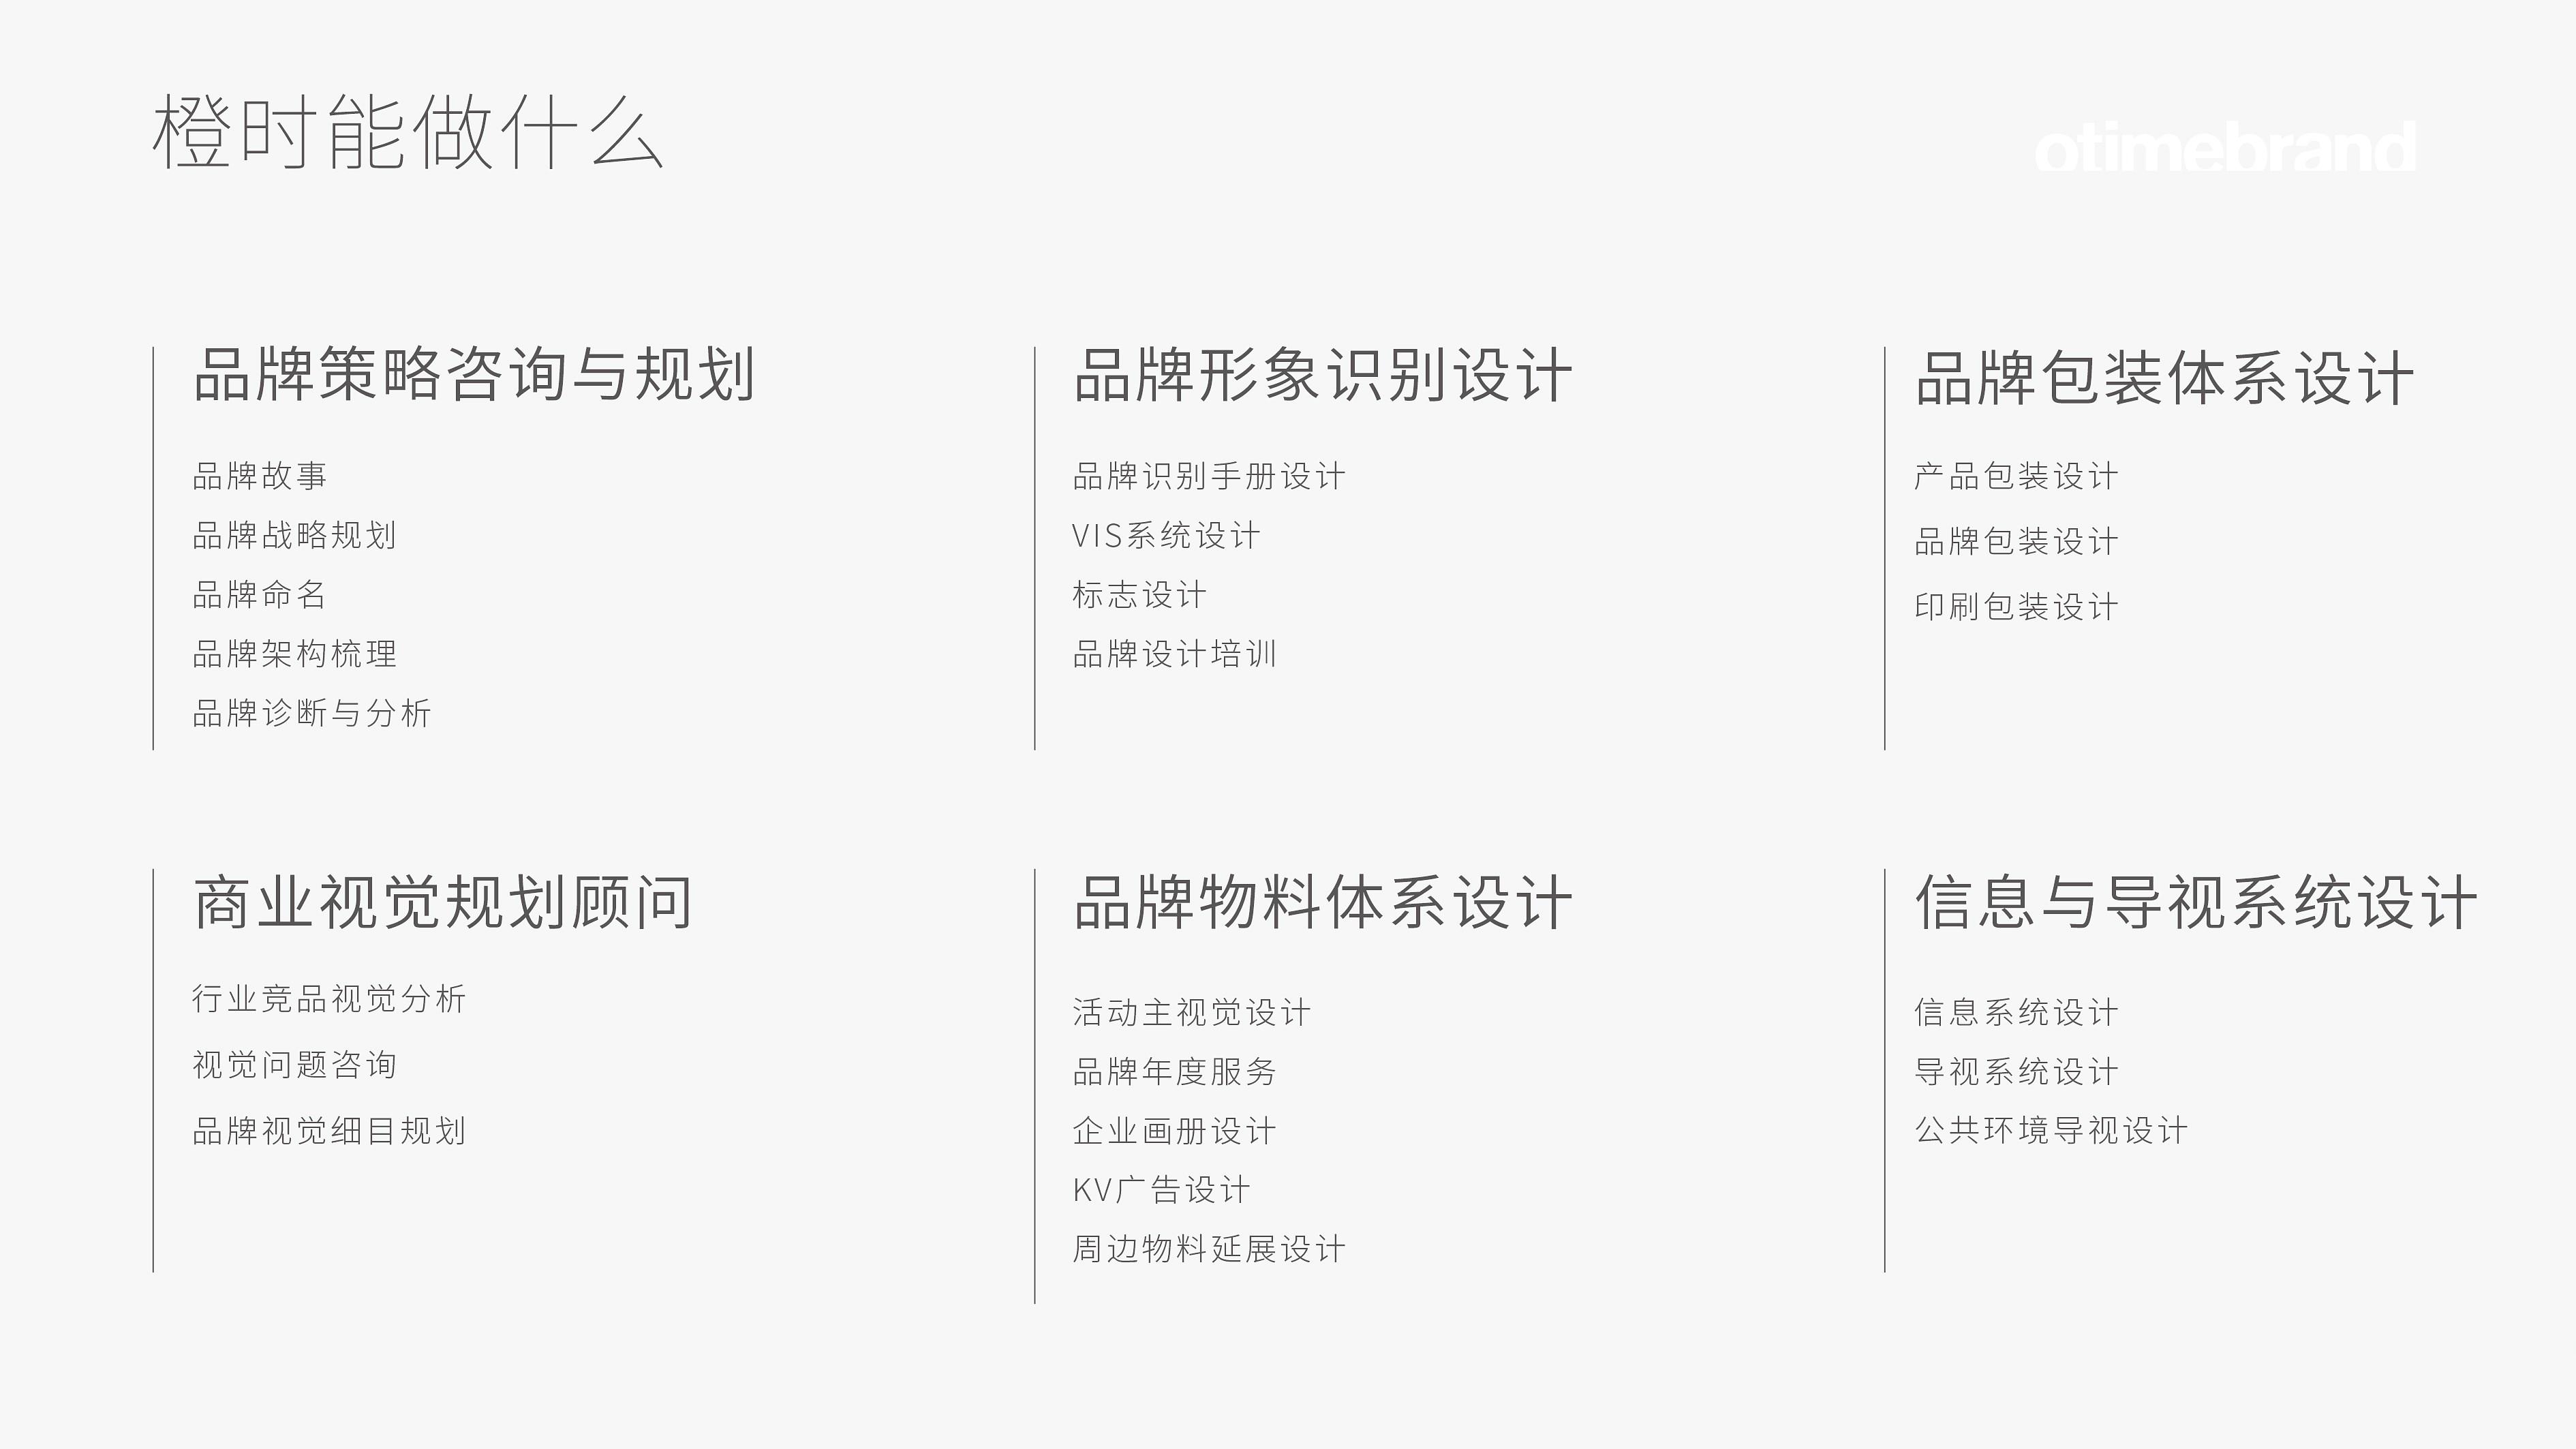 ppt介绍-03.jpg